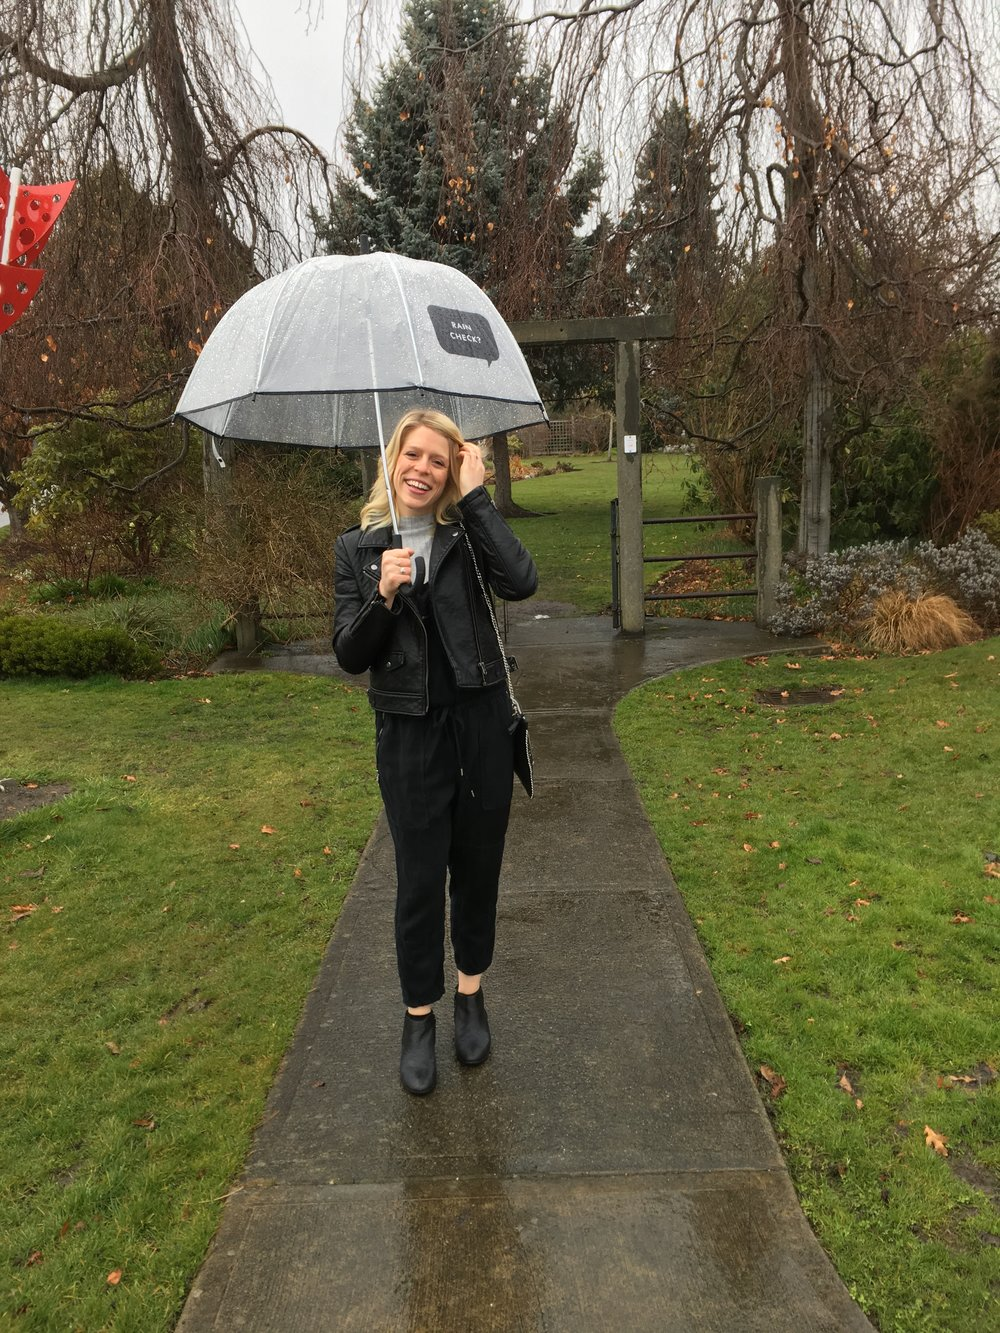 Kate Spad e Rain Check? Umbrella c/o Elyse Longair